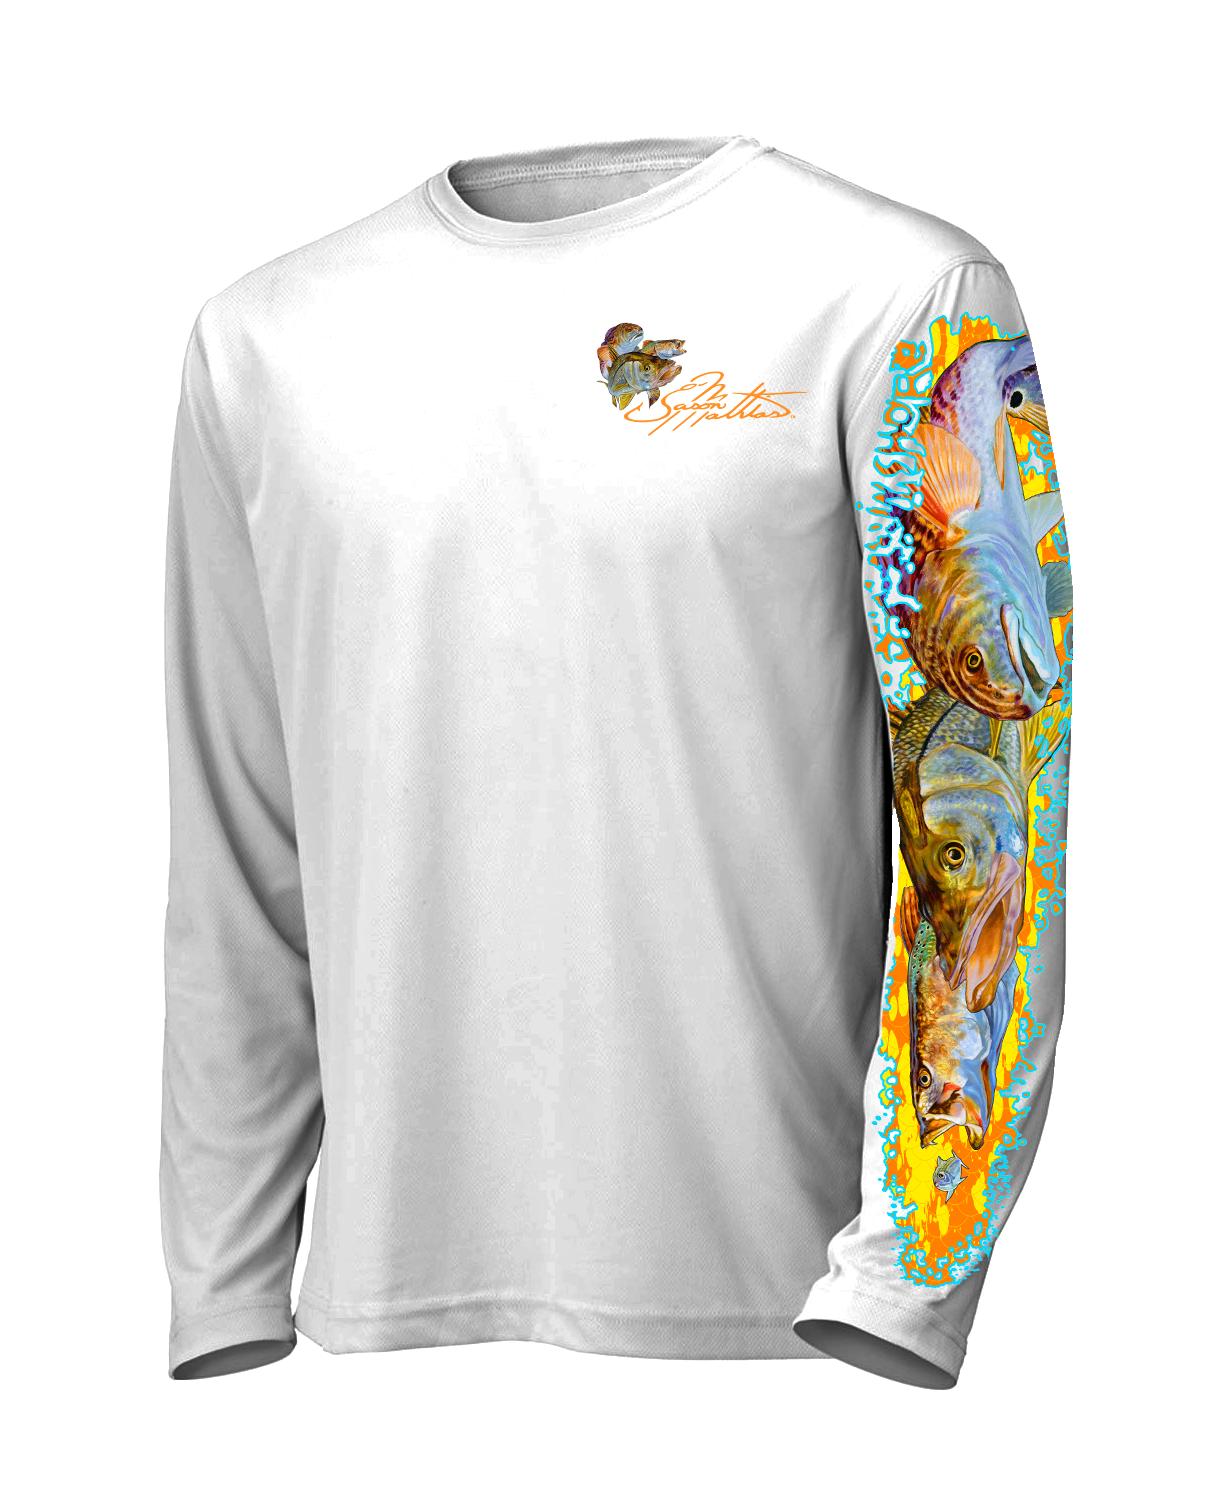 inshore-slam-shirt-white-front-jason-mathias-snook-trout-redfish.png